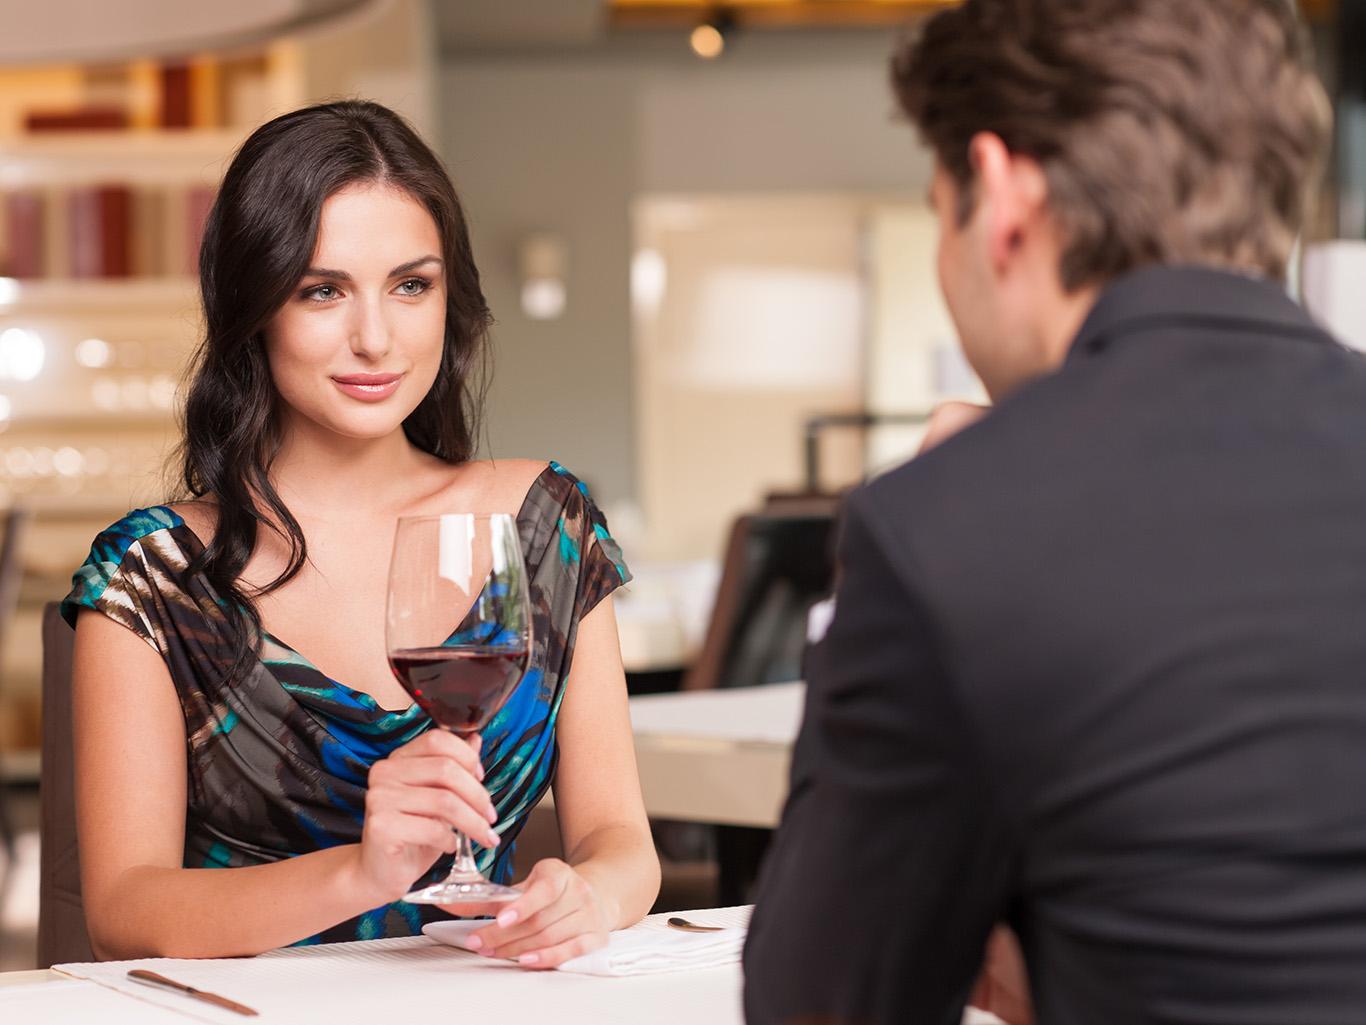 Dating an undergrad girl